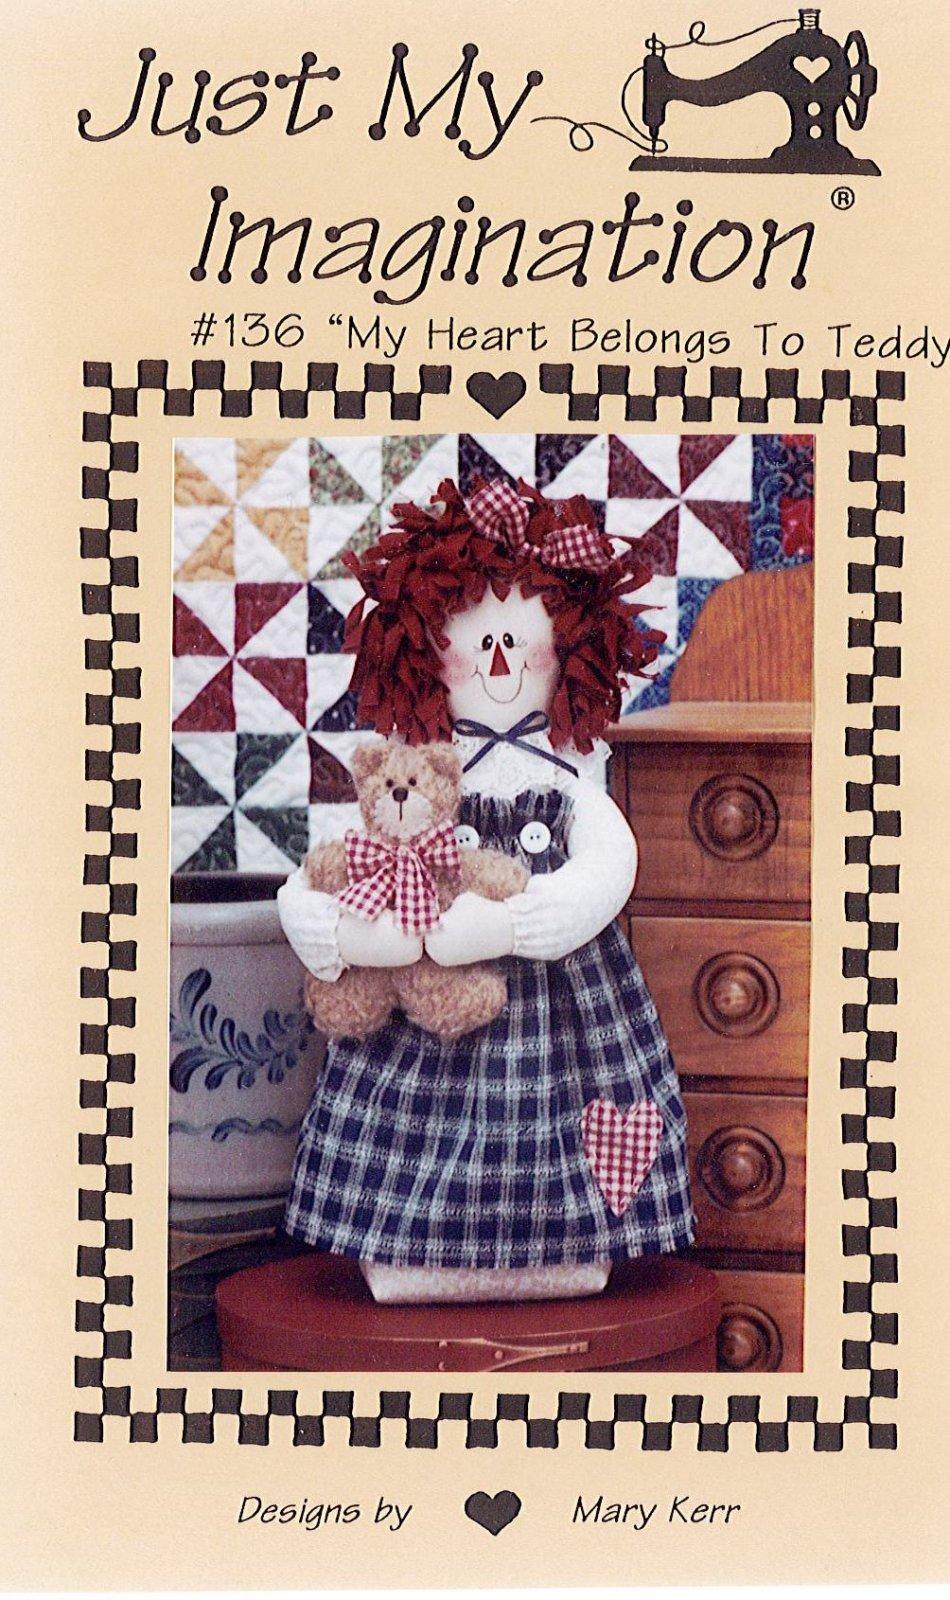 JUST MY IMAGINATION - My Heart Belongs to Teddy